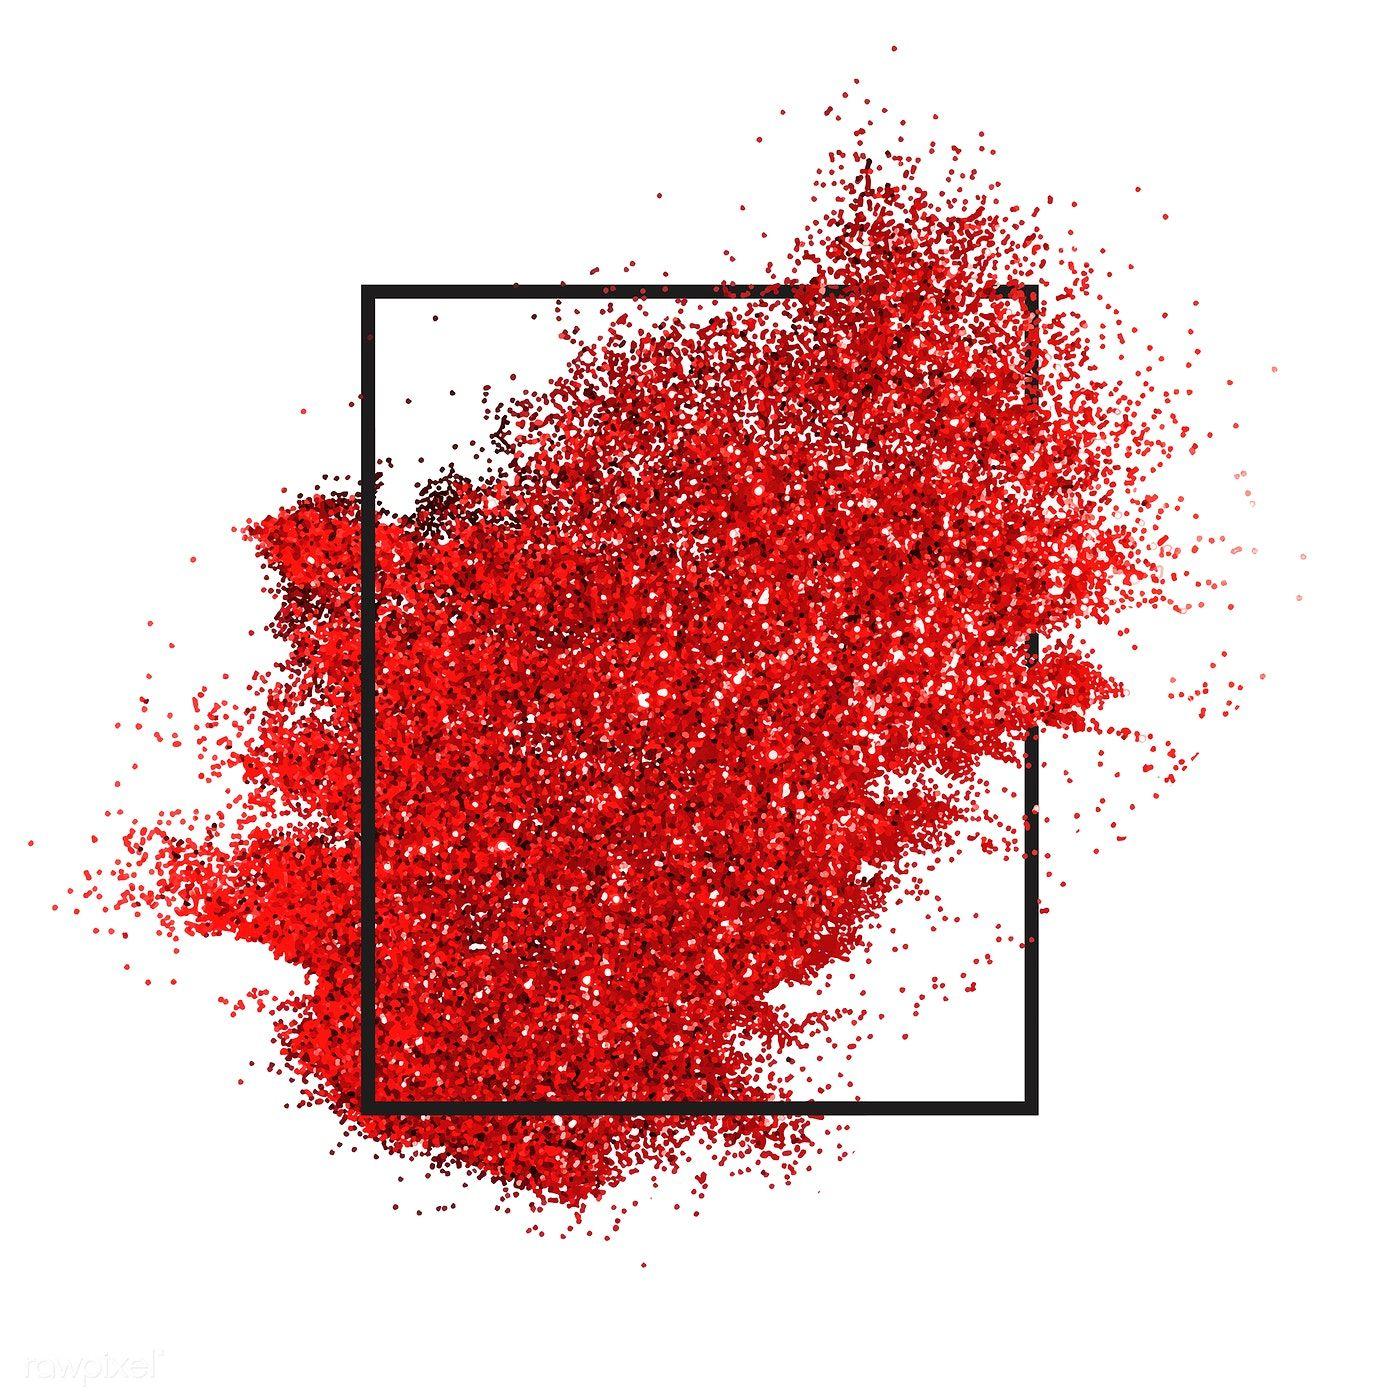 Red Sprinkled Glitter Badge Vector Free Image By Rawpixel Com Ake Abstraktnye Fony Krasnyj Fon Dizajn Karty